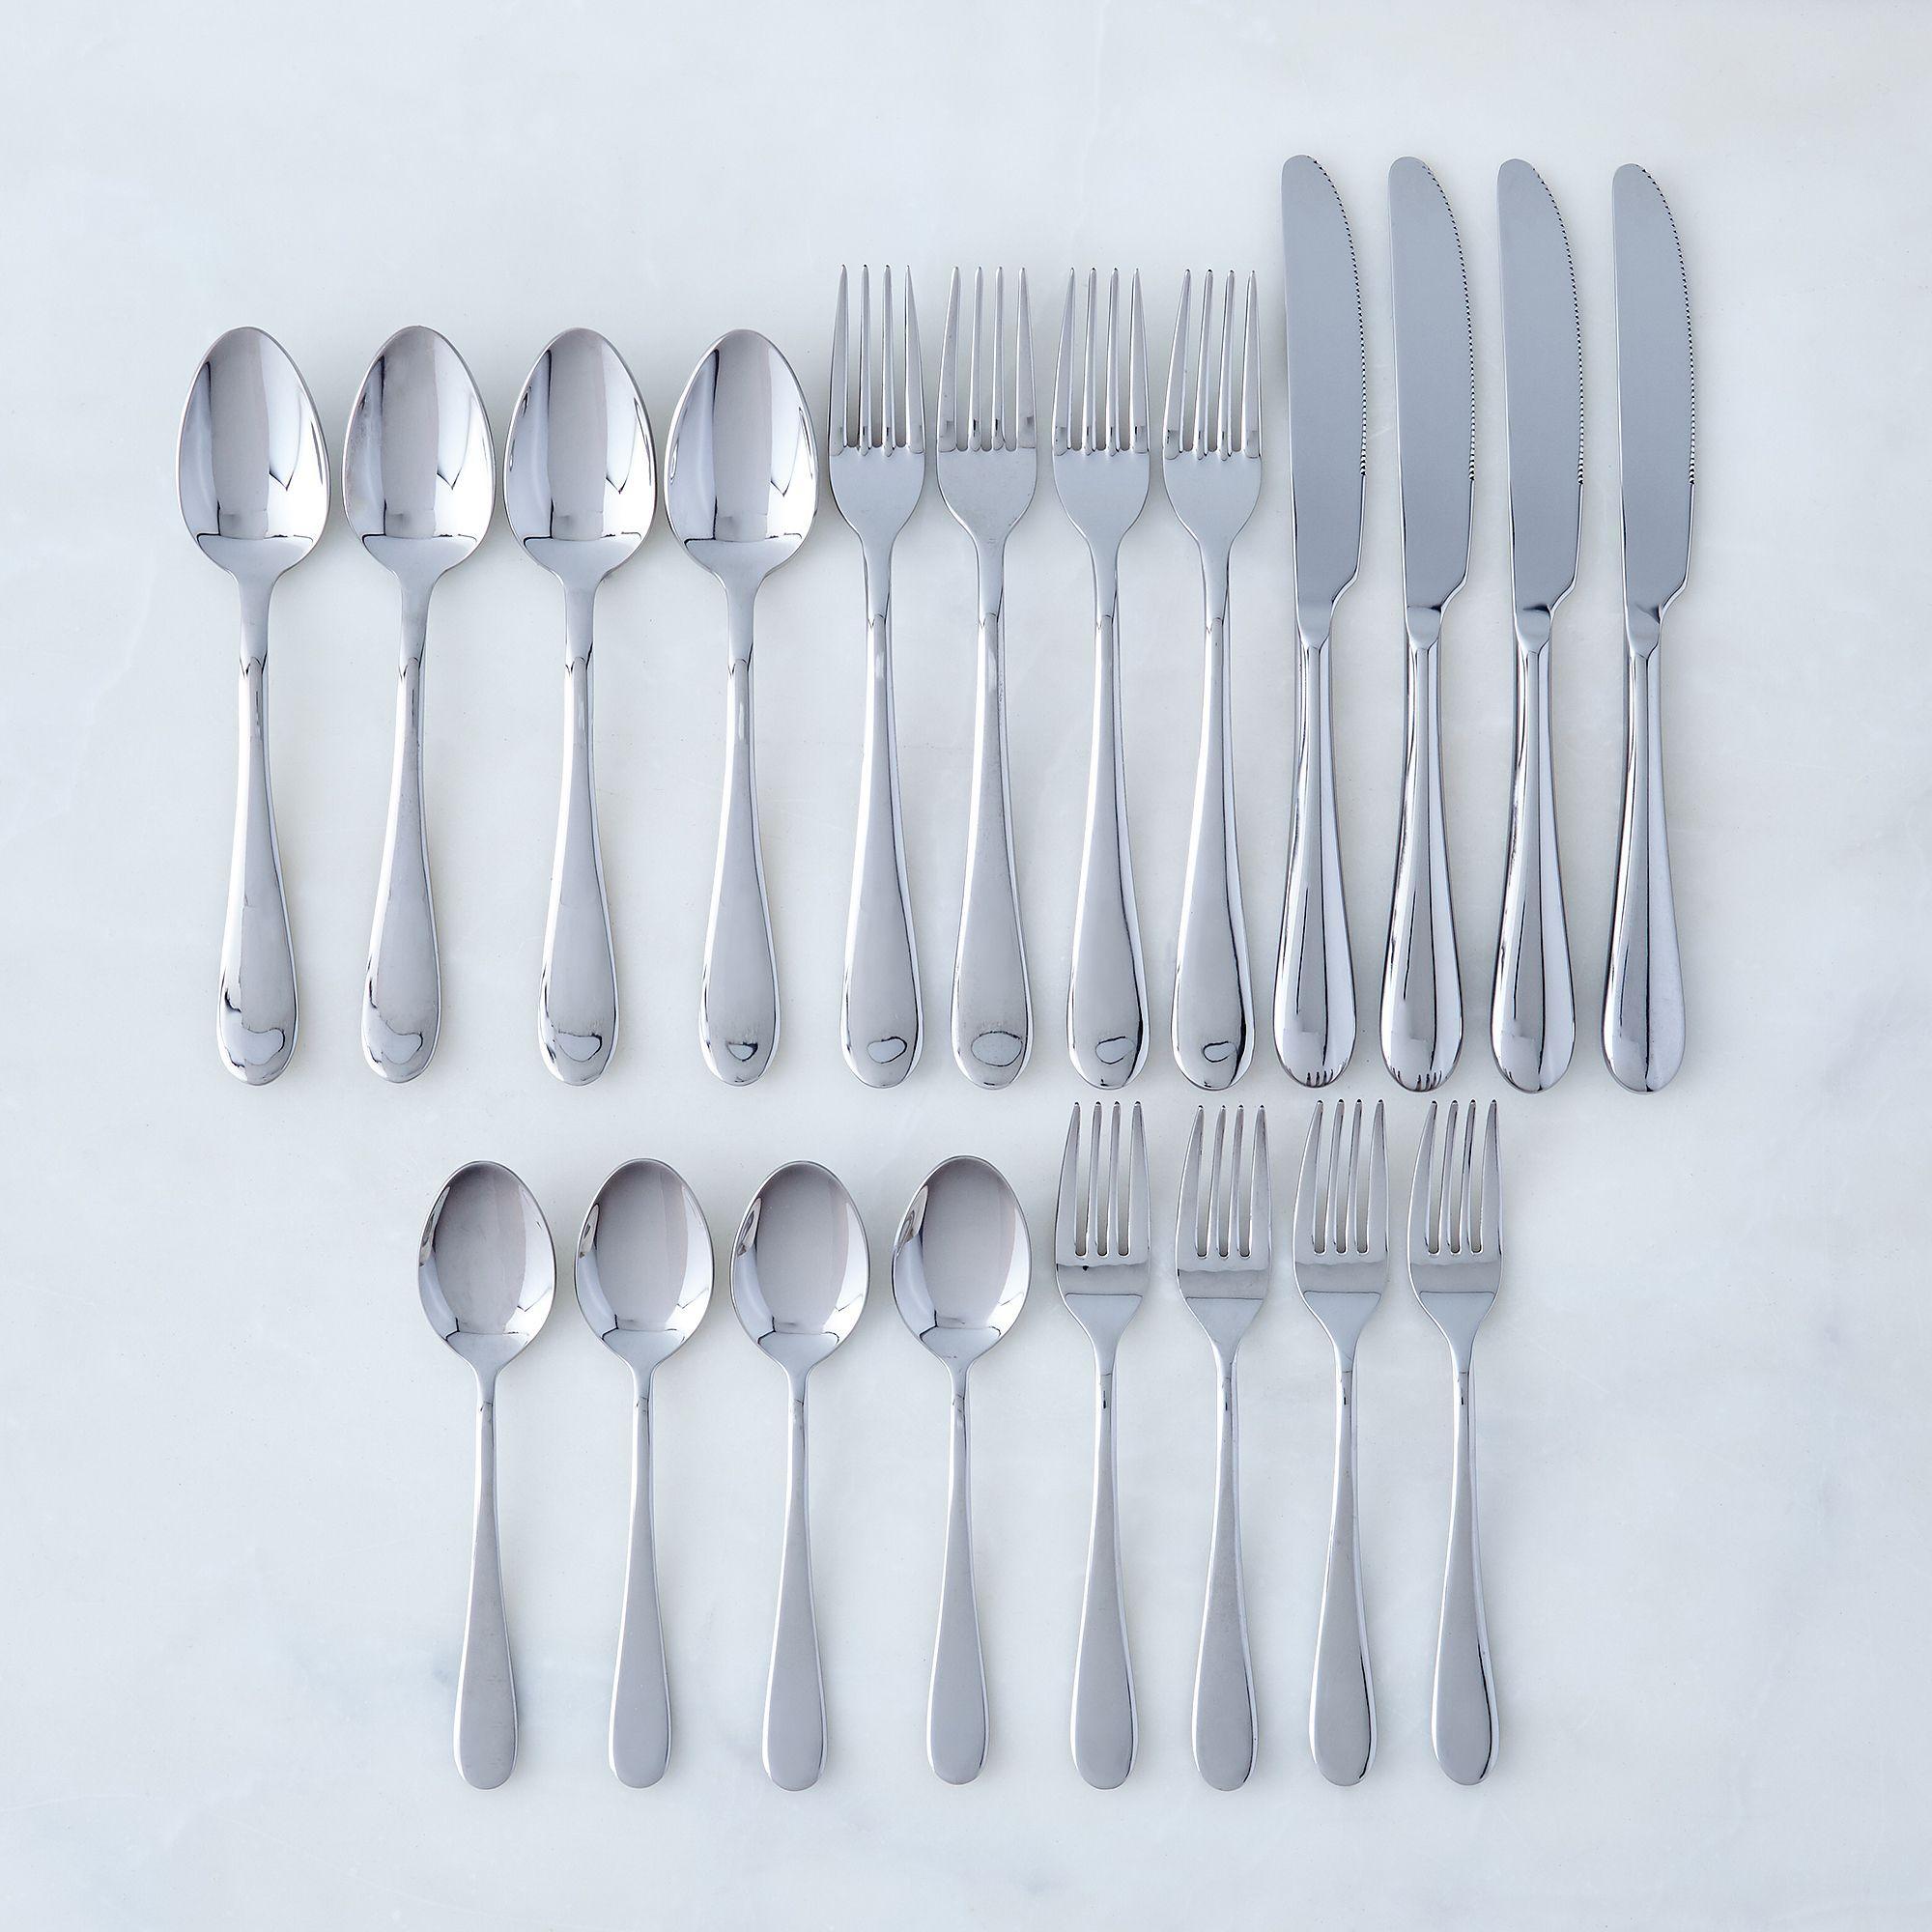 Italian Stainless Steel Flatware (20-Piece Set) | Kitchen redo ...